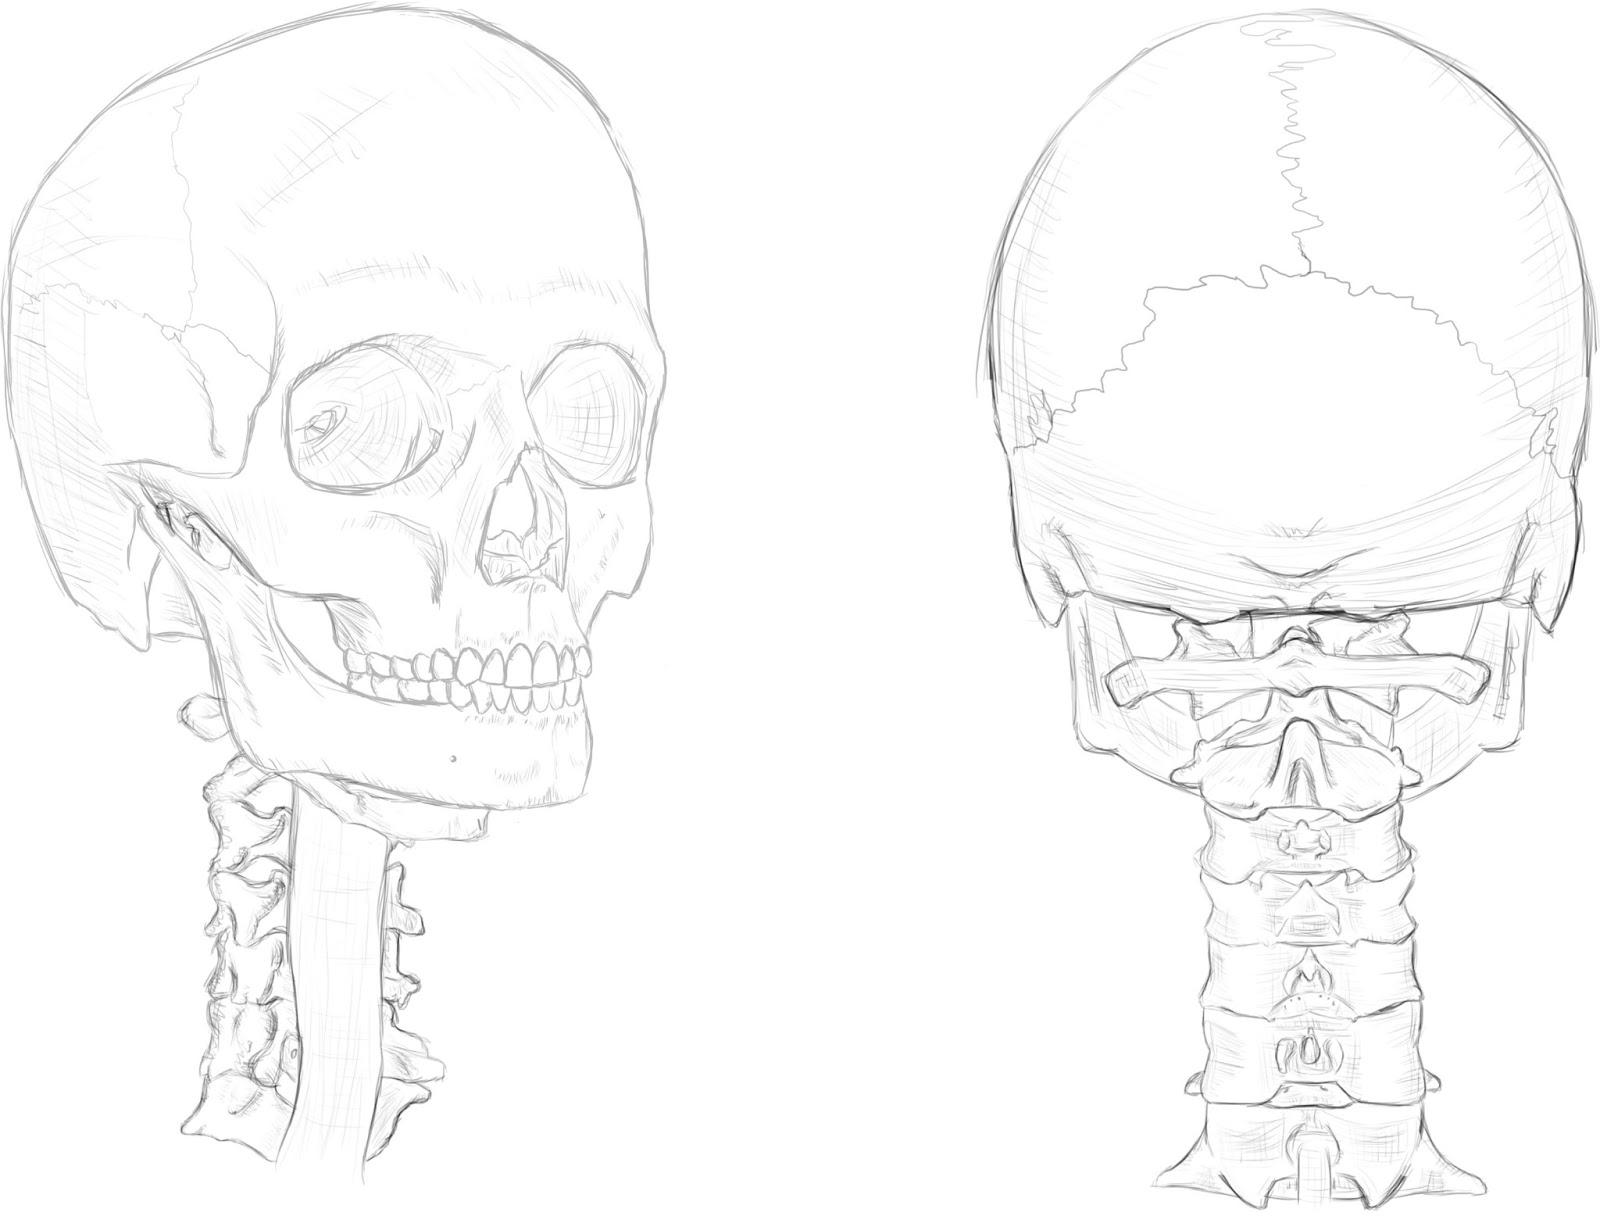 Project Aither: Estudio anatómico: El esqueleto, parte 1